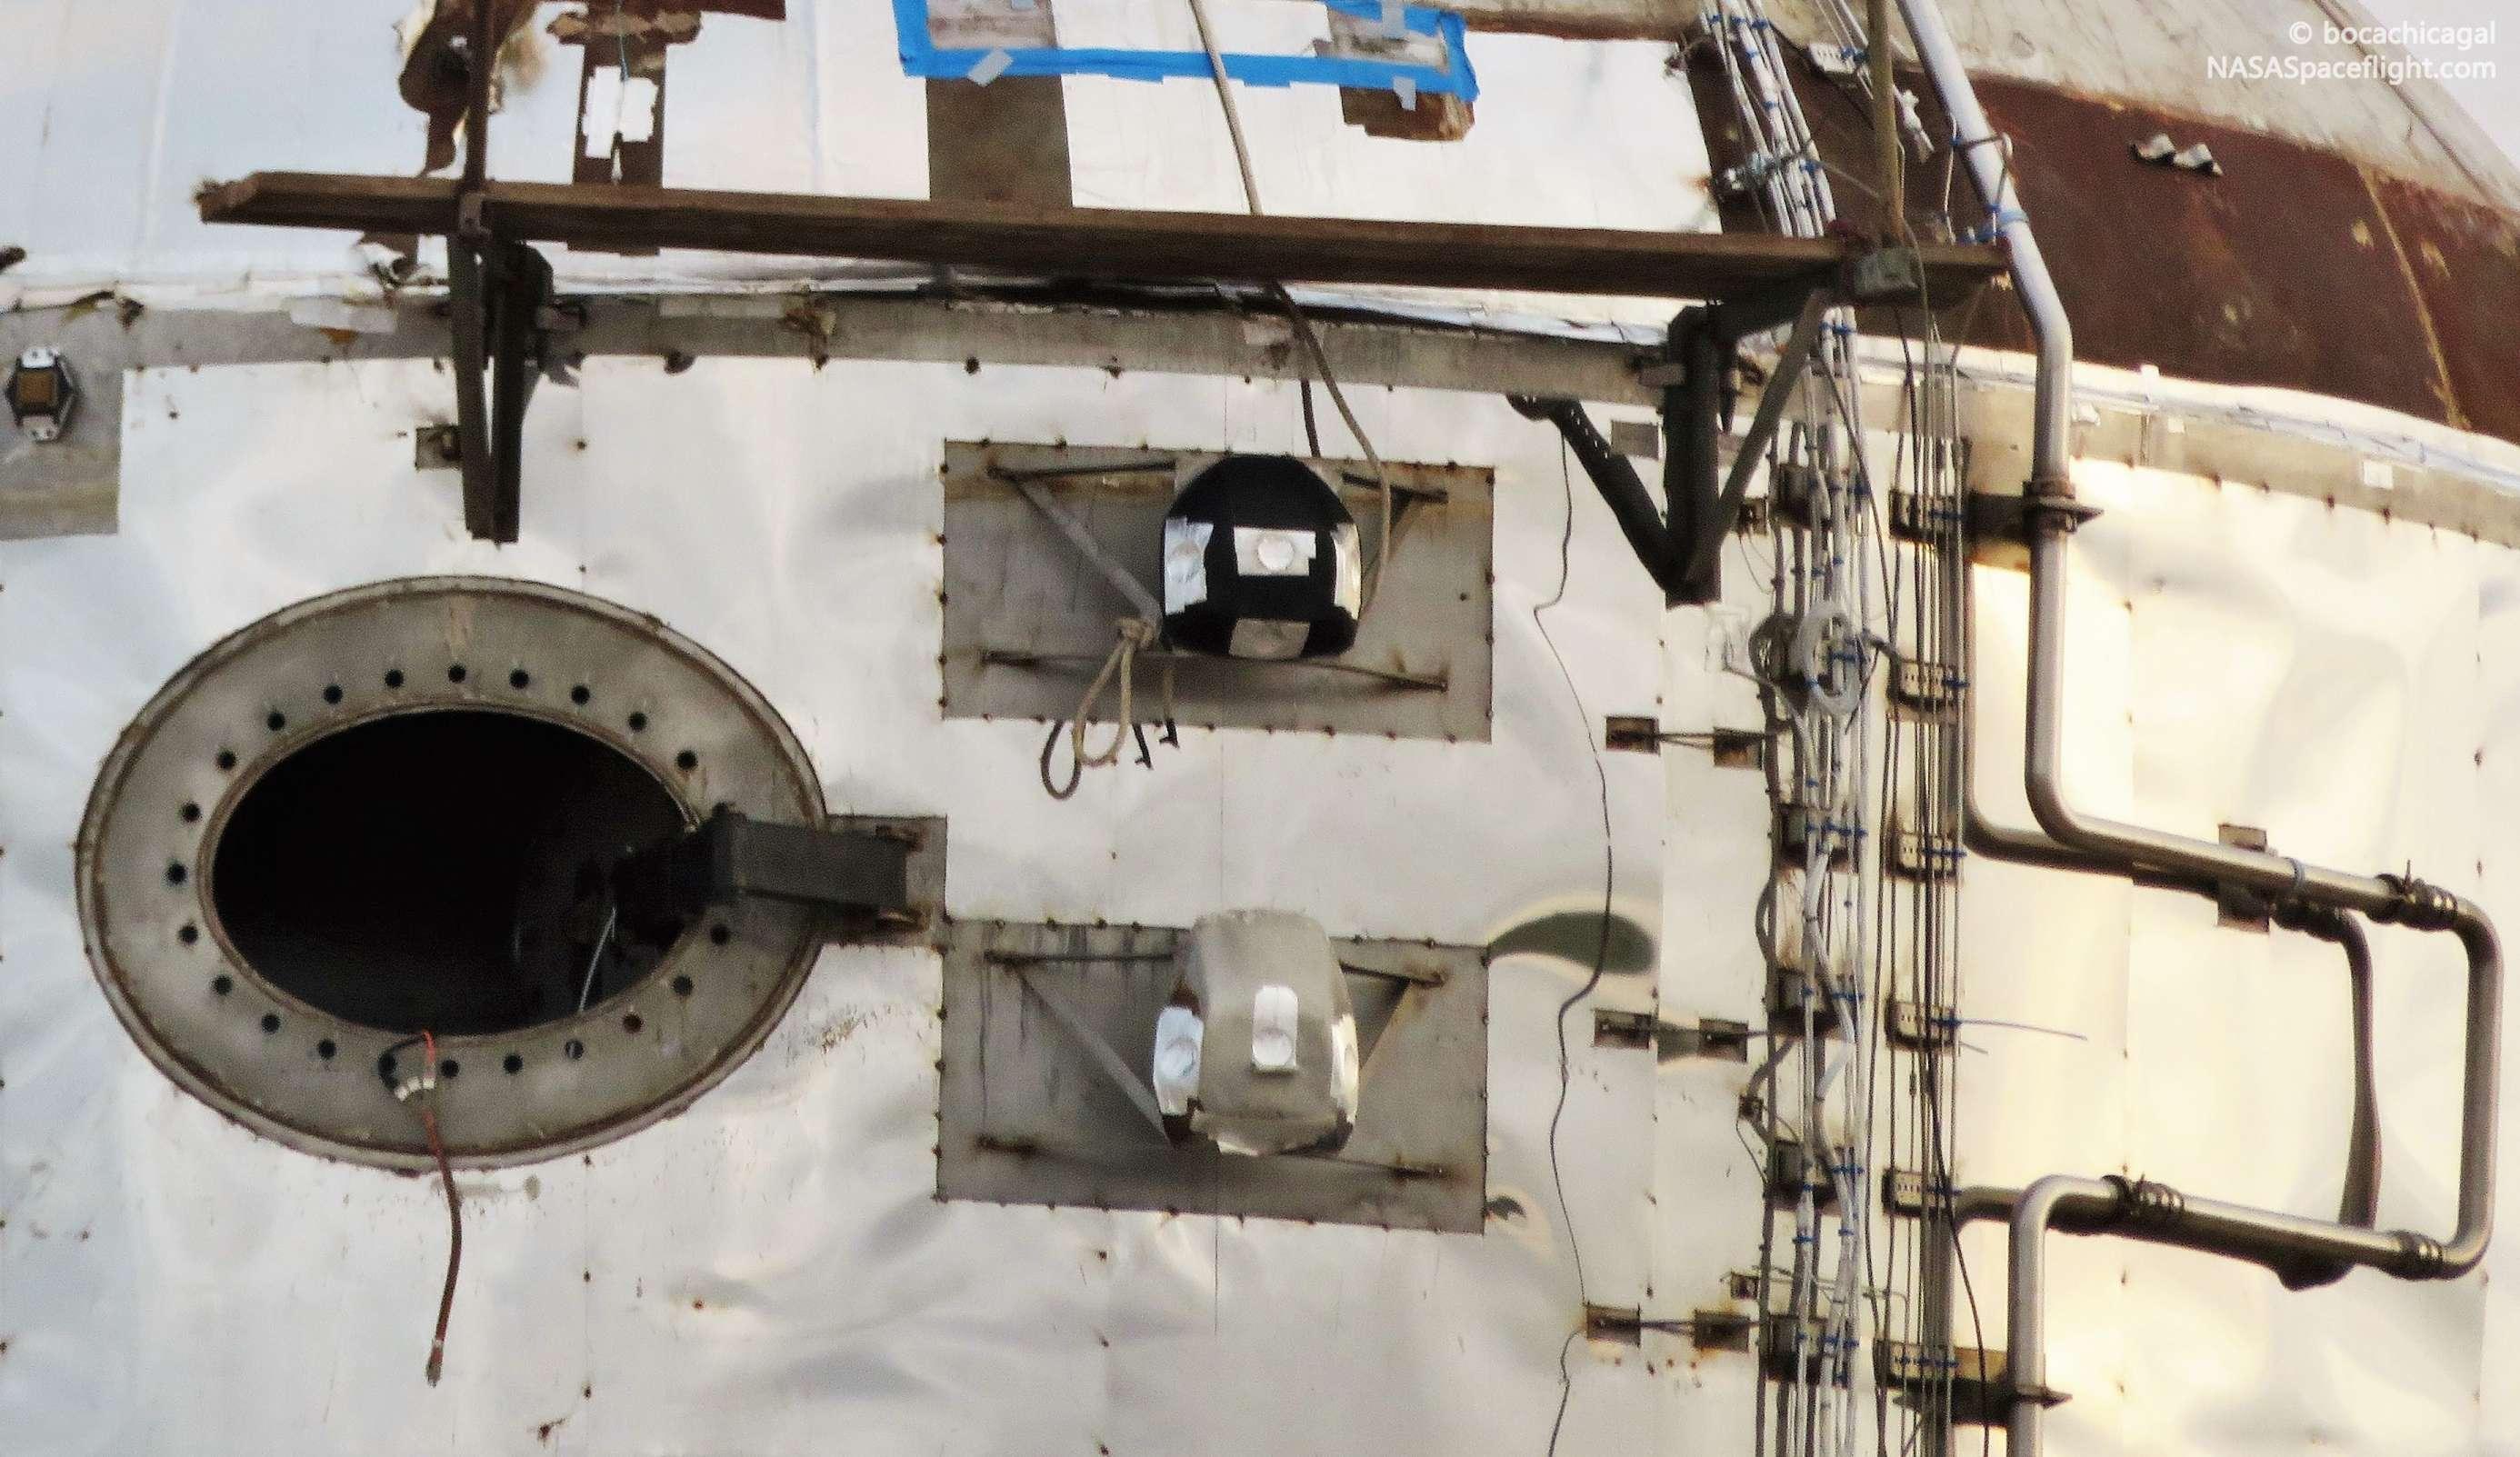 Boca Chica Starhopper ACS install 050719 (NASASpaceflight – bocachicagal) 4 crop (c)